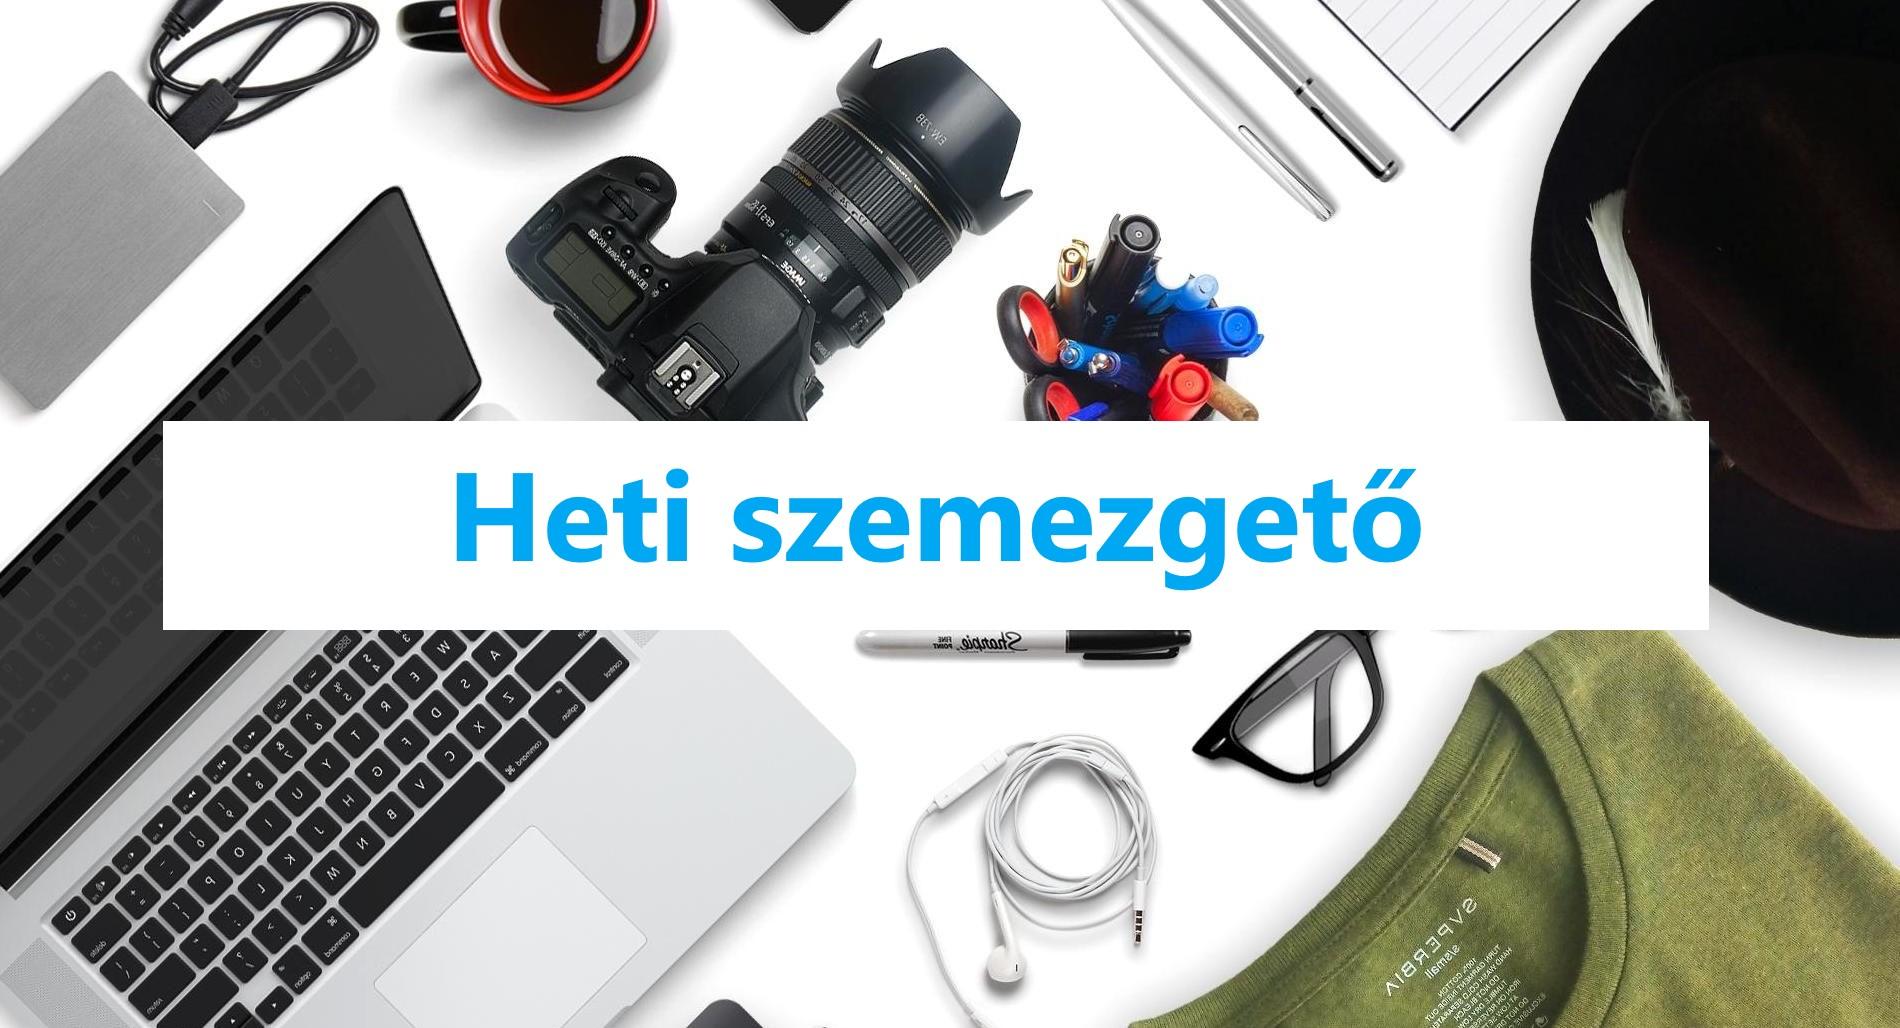 heti_szemezgeto_uj_46.jpg